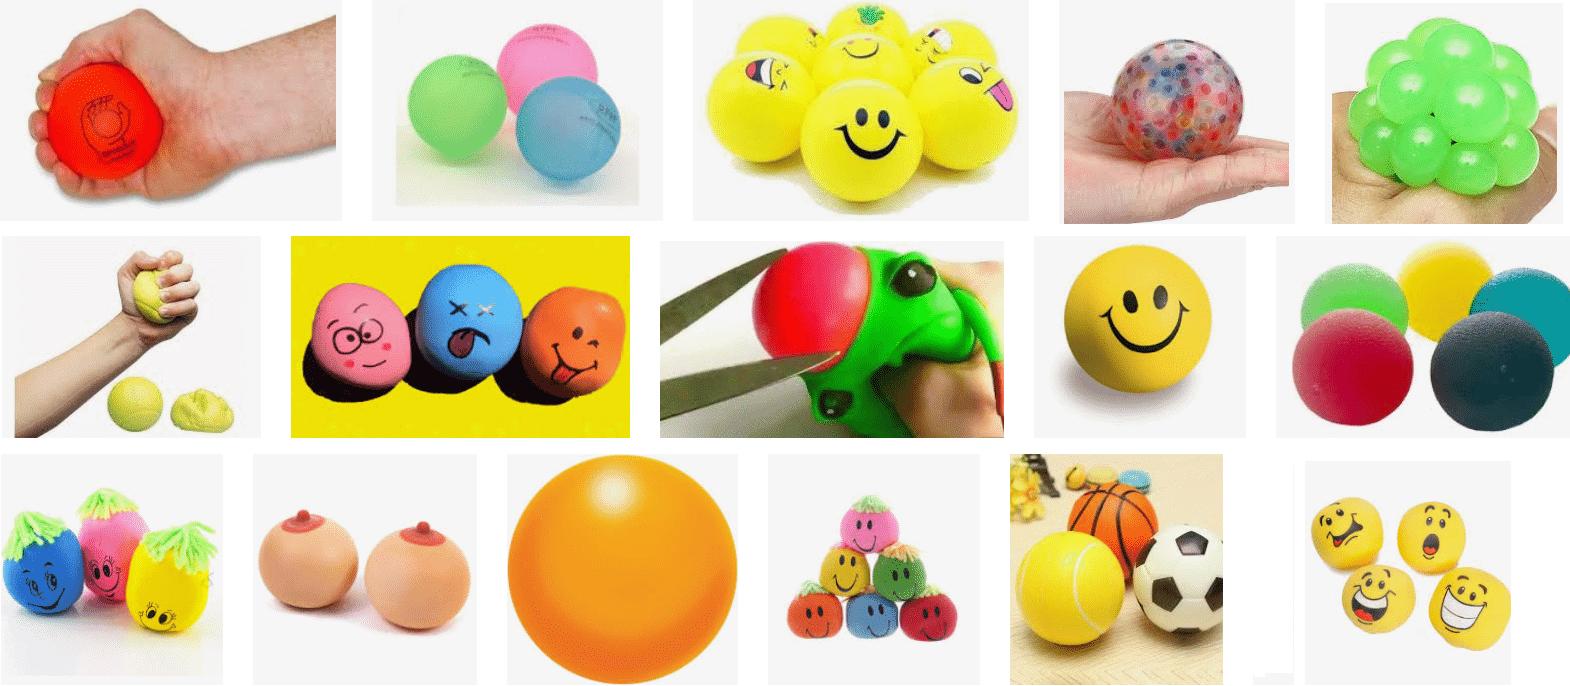 Wonderbaarlijk Stressbal stressballon maken als surprise - Hobby.blogo.nl UG-64